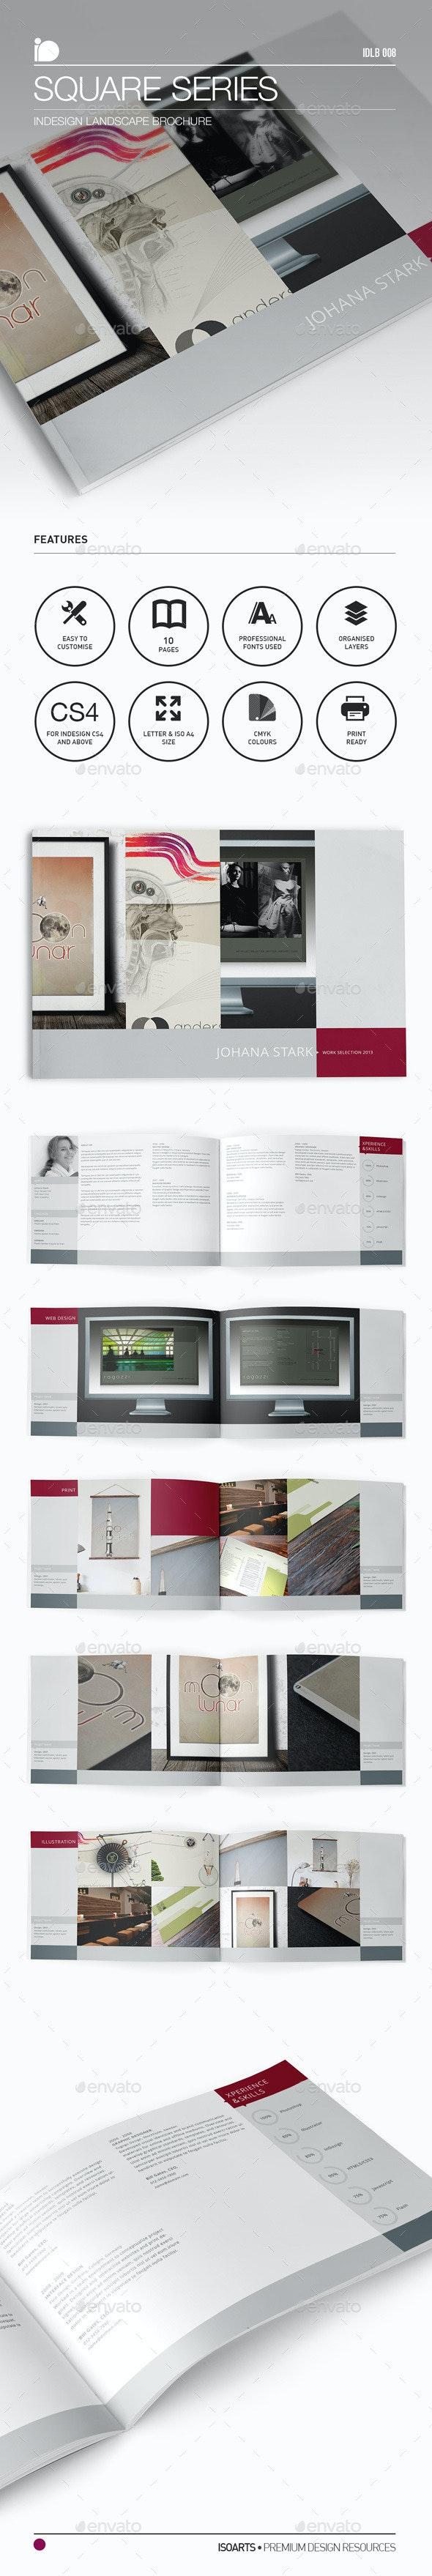 Landscape Brochure • Square Series - Print Templates